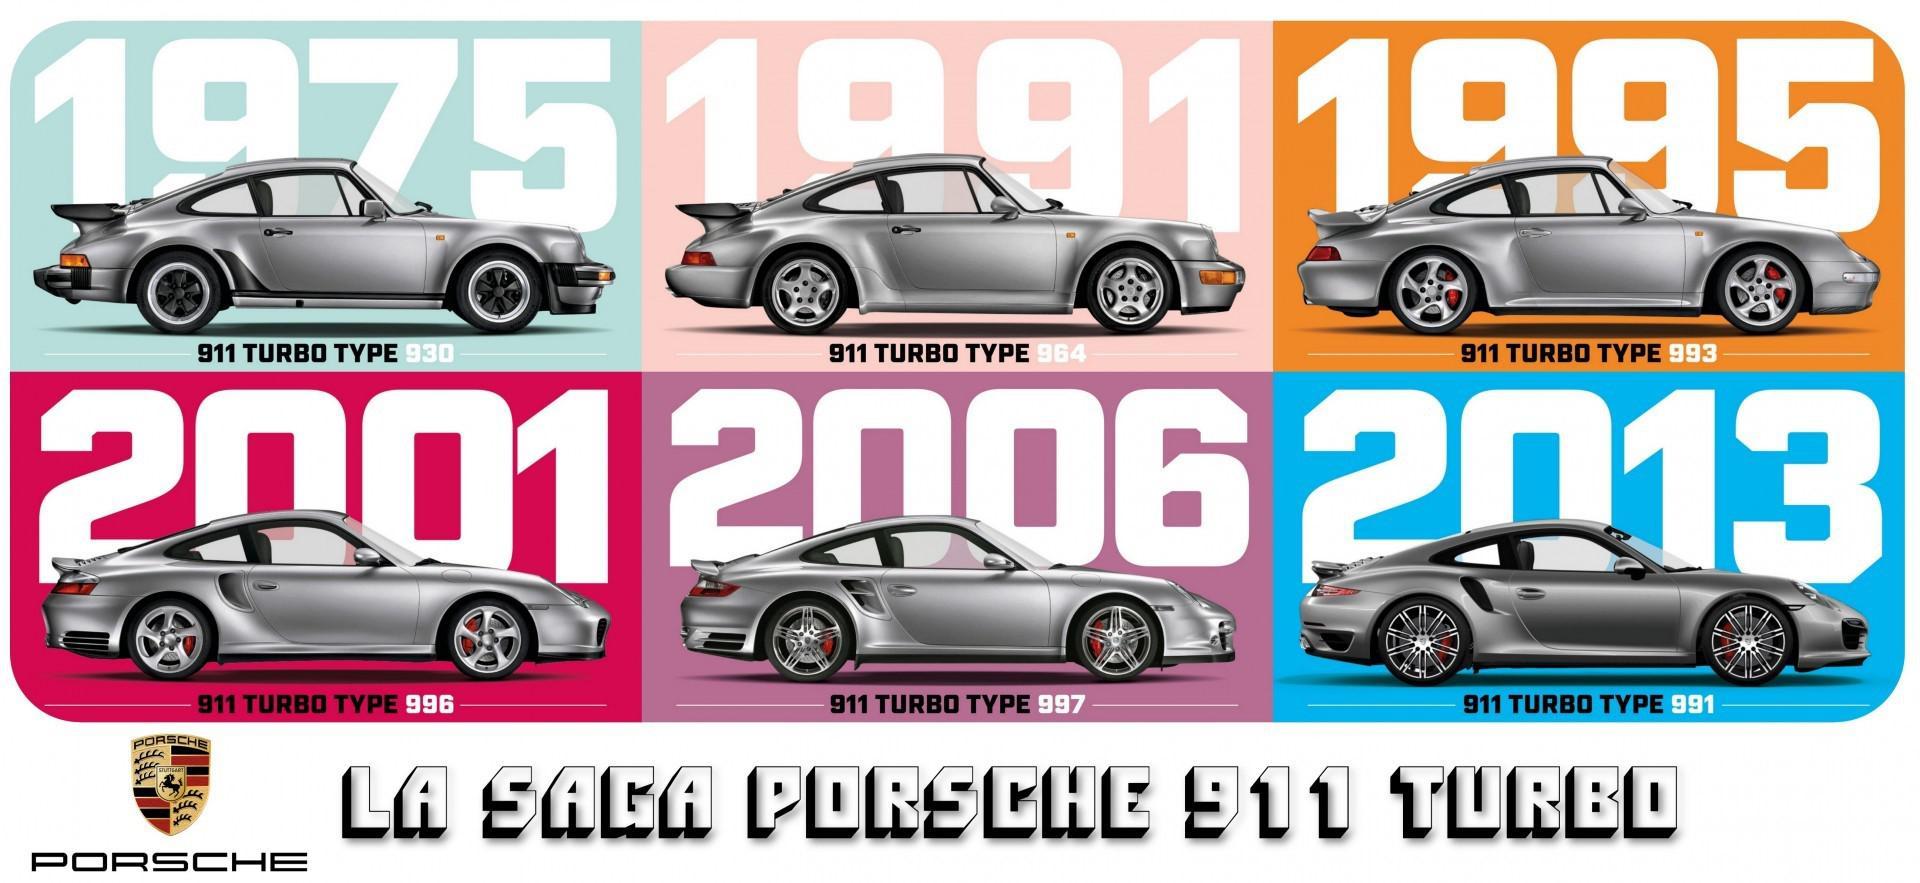 La saga Porsche 911 Turbo: Le guide d'achat